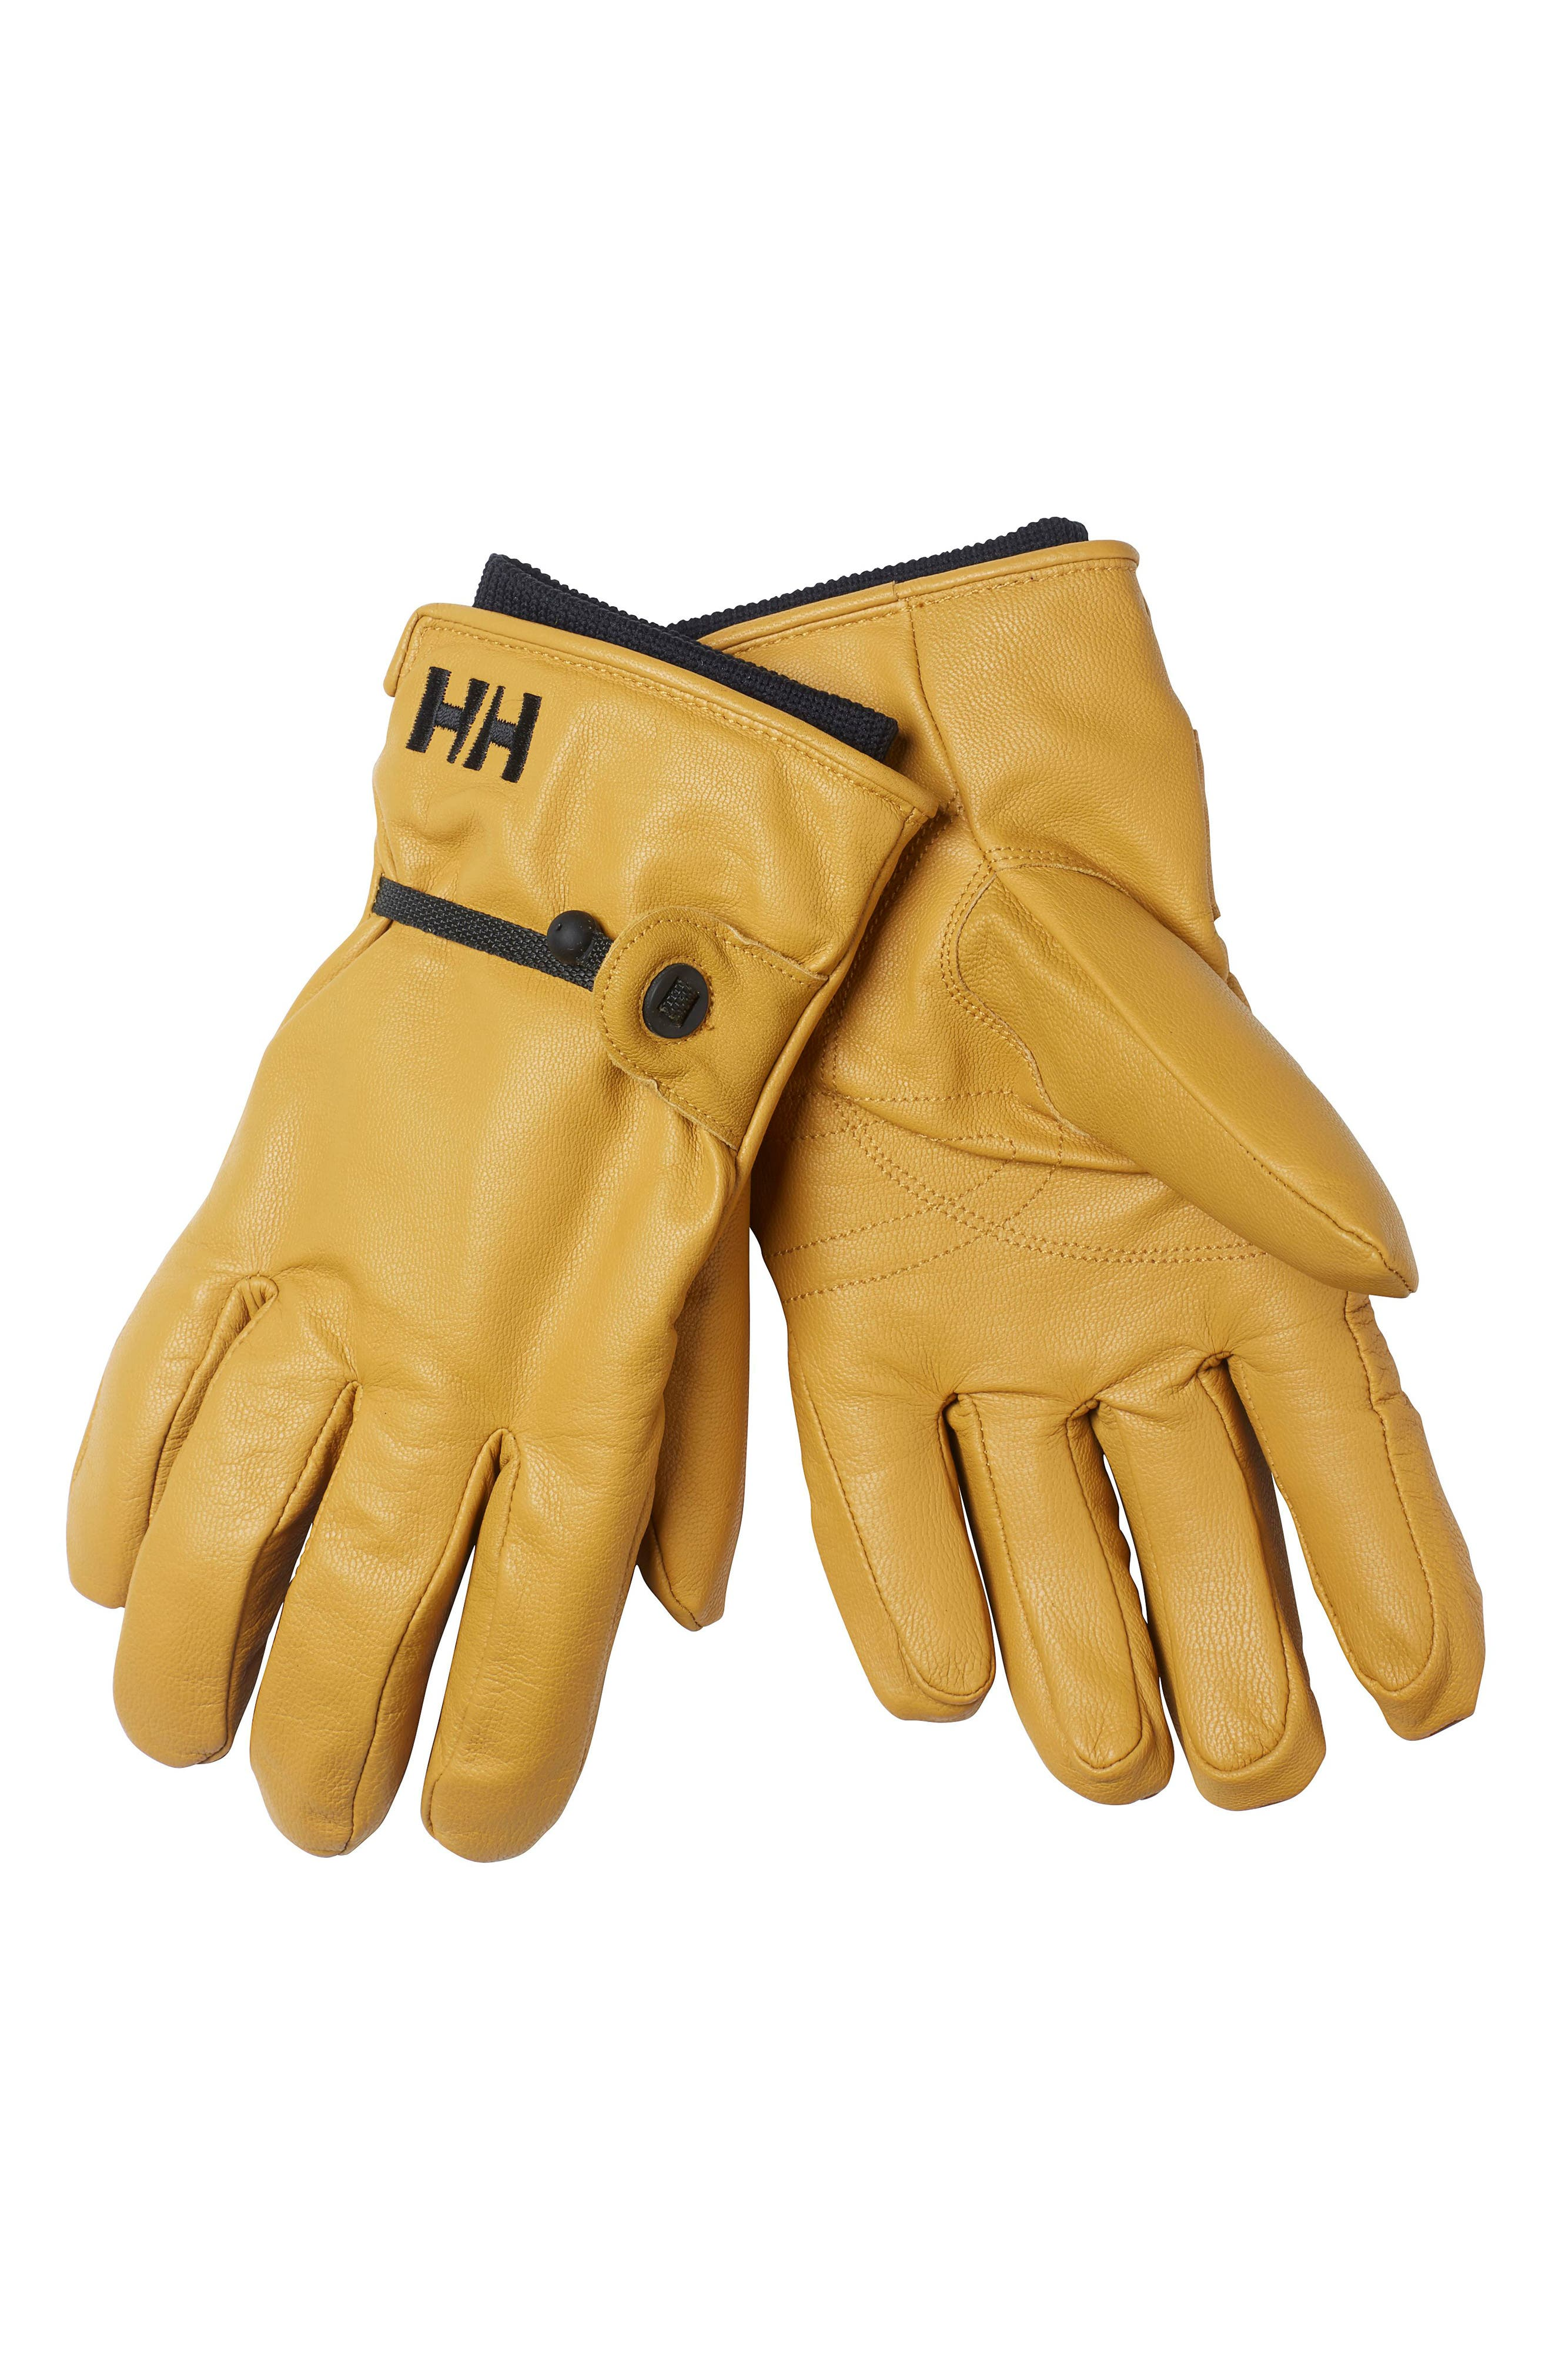 Vor Leather Gloves,                             Main thumbnail 1, color,                             WHEAT